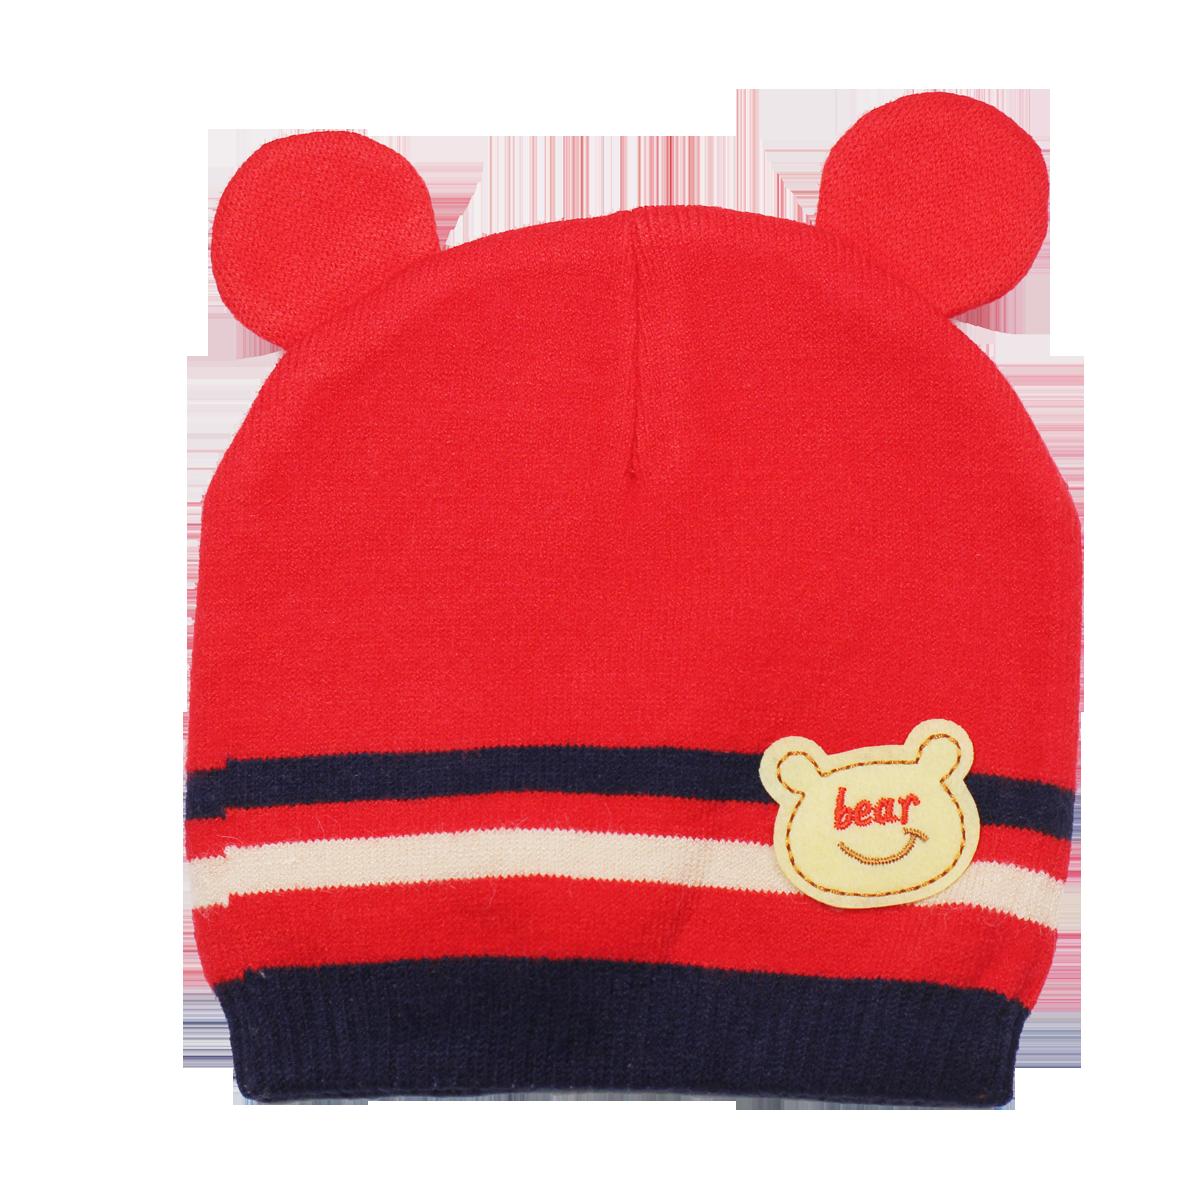 Mũ len hình gấu TE004 (6M+)